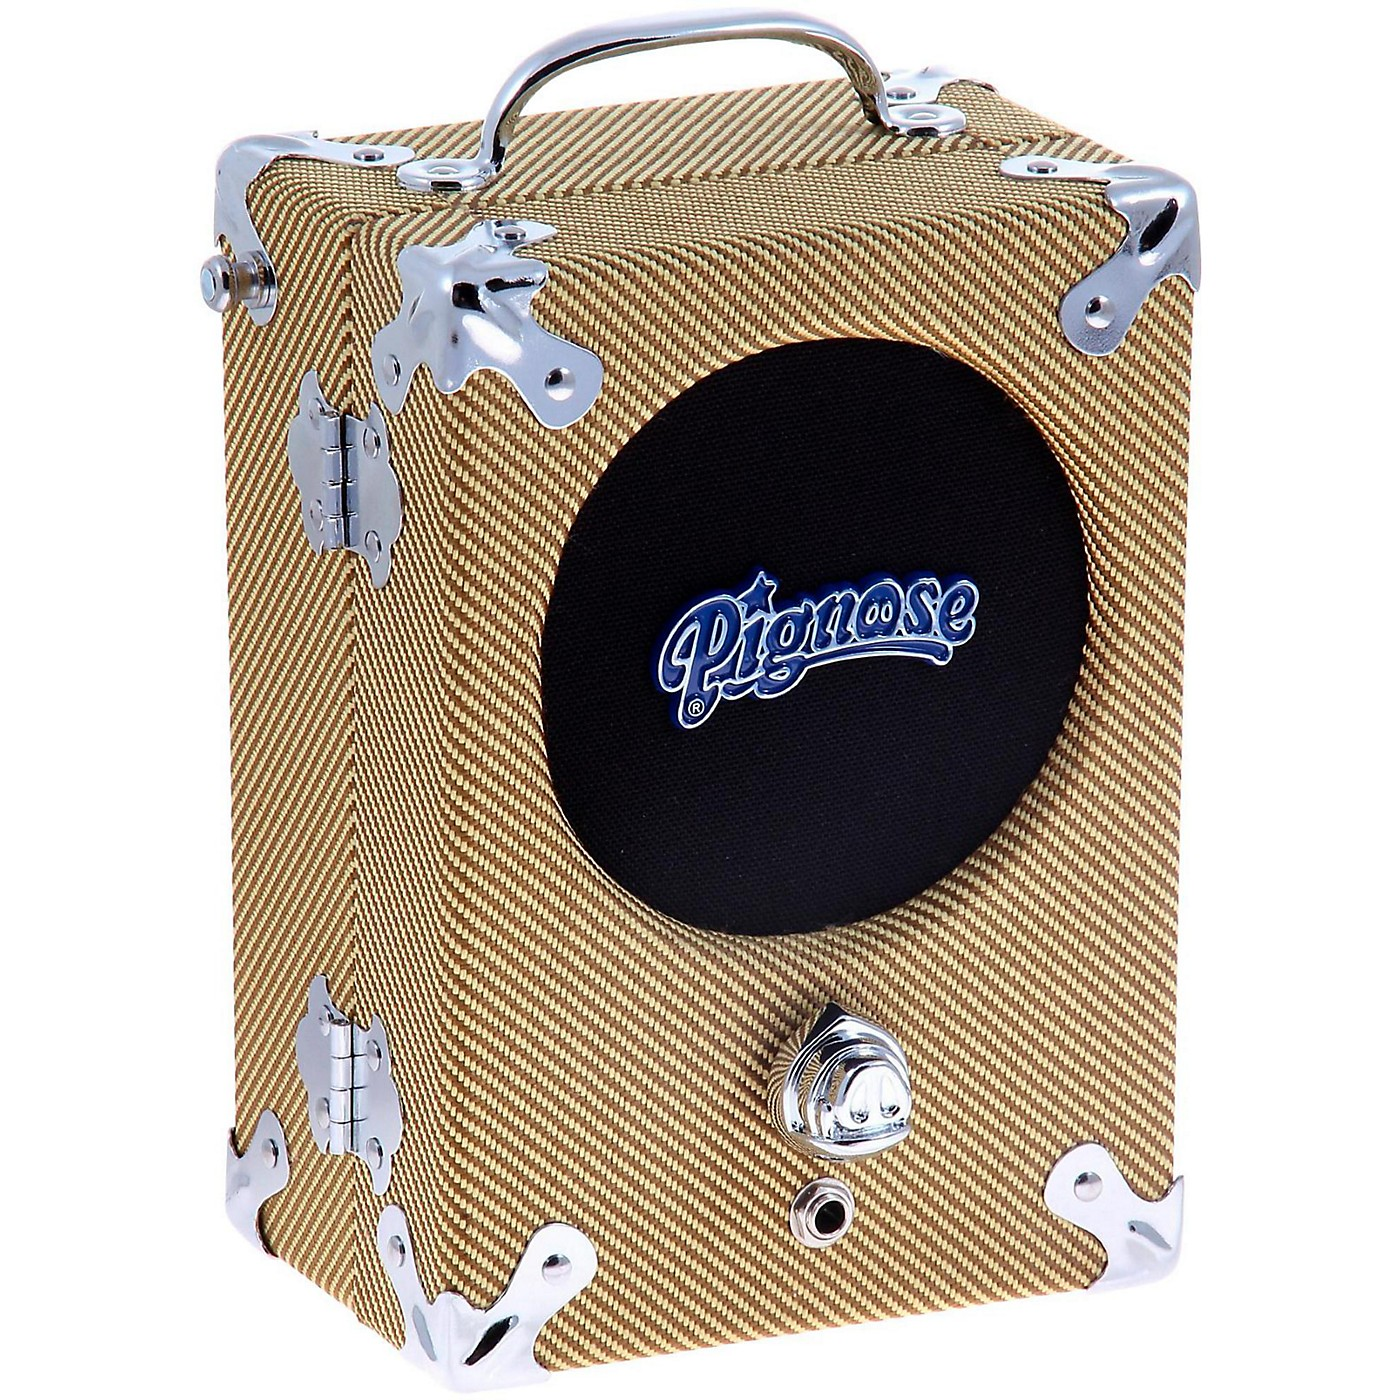 Pignose 7-100TW 5W 1x5 Tweed Portable Guitar Combo Amplifier thumbnail